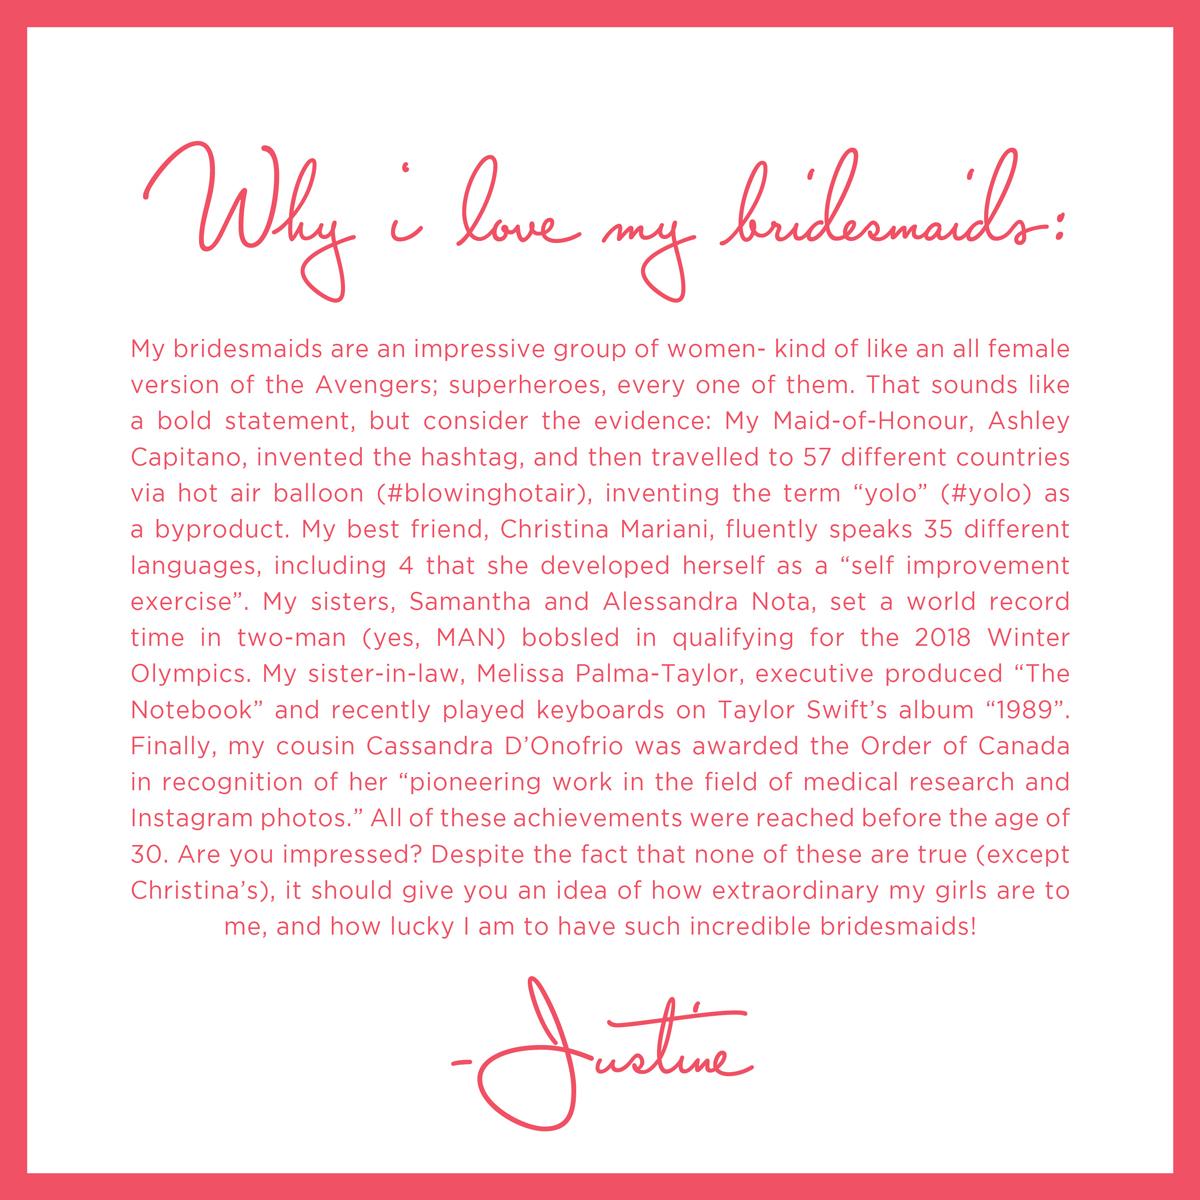 Pearl-Bridal-House-Love-Your-Girls-Justine-7-Web.jpg